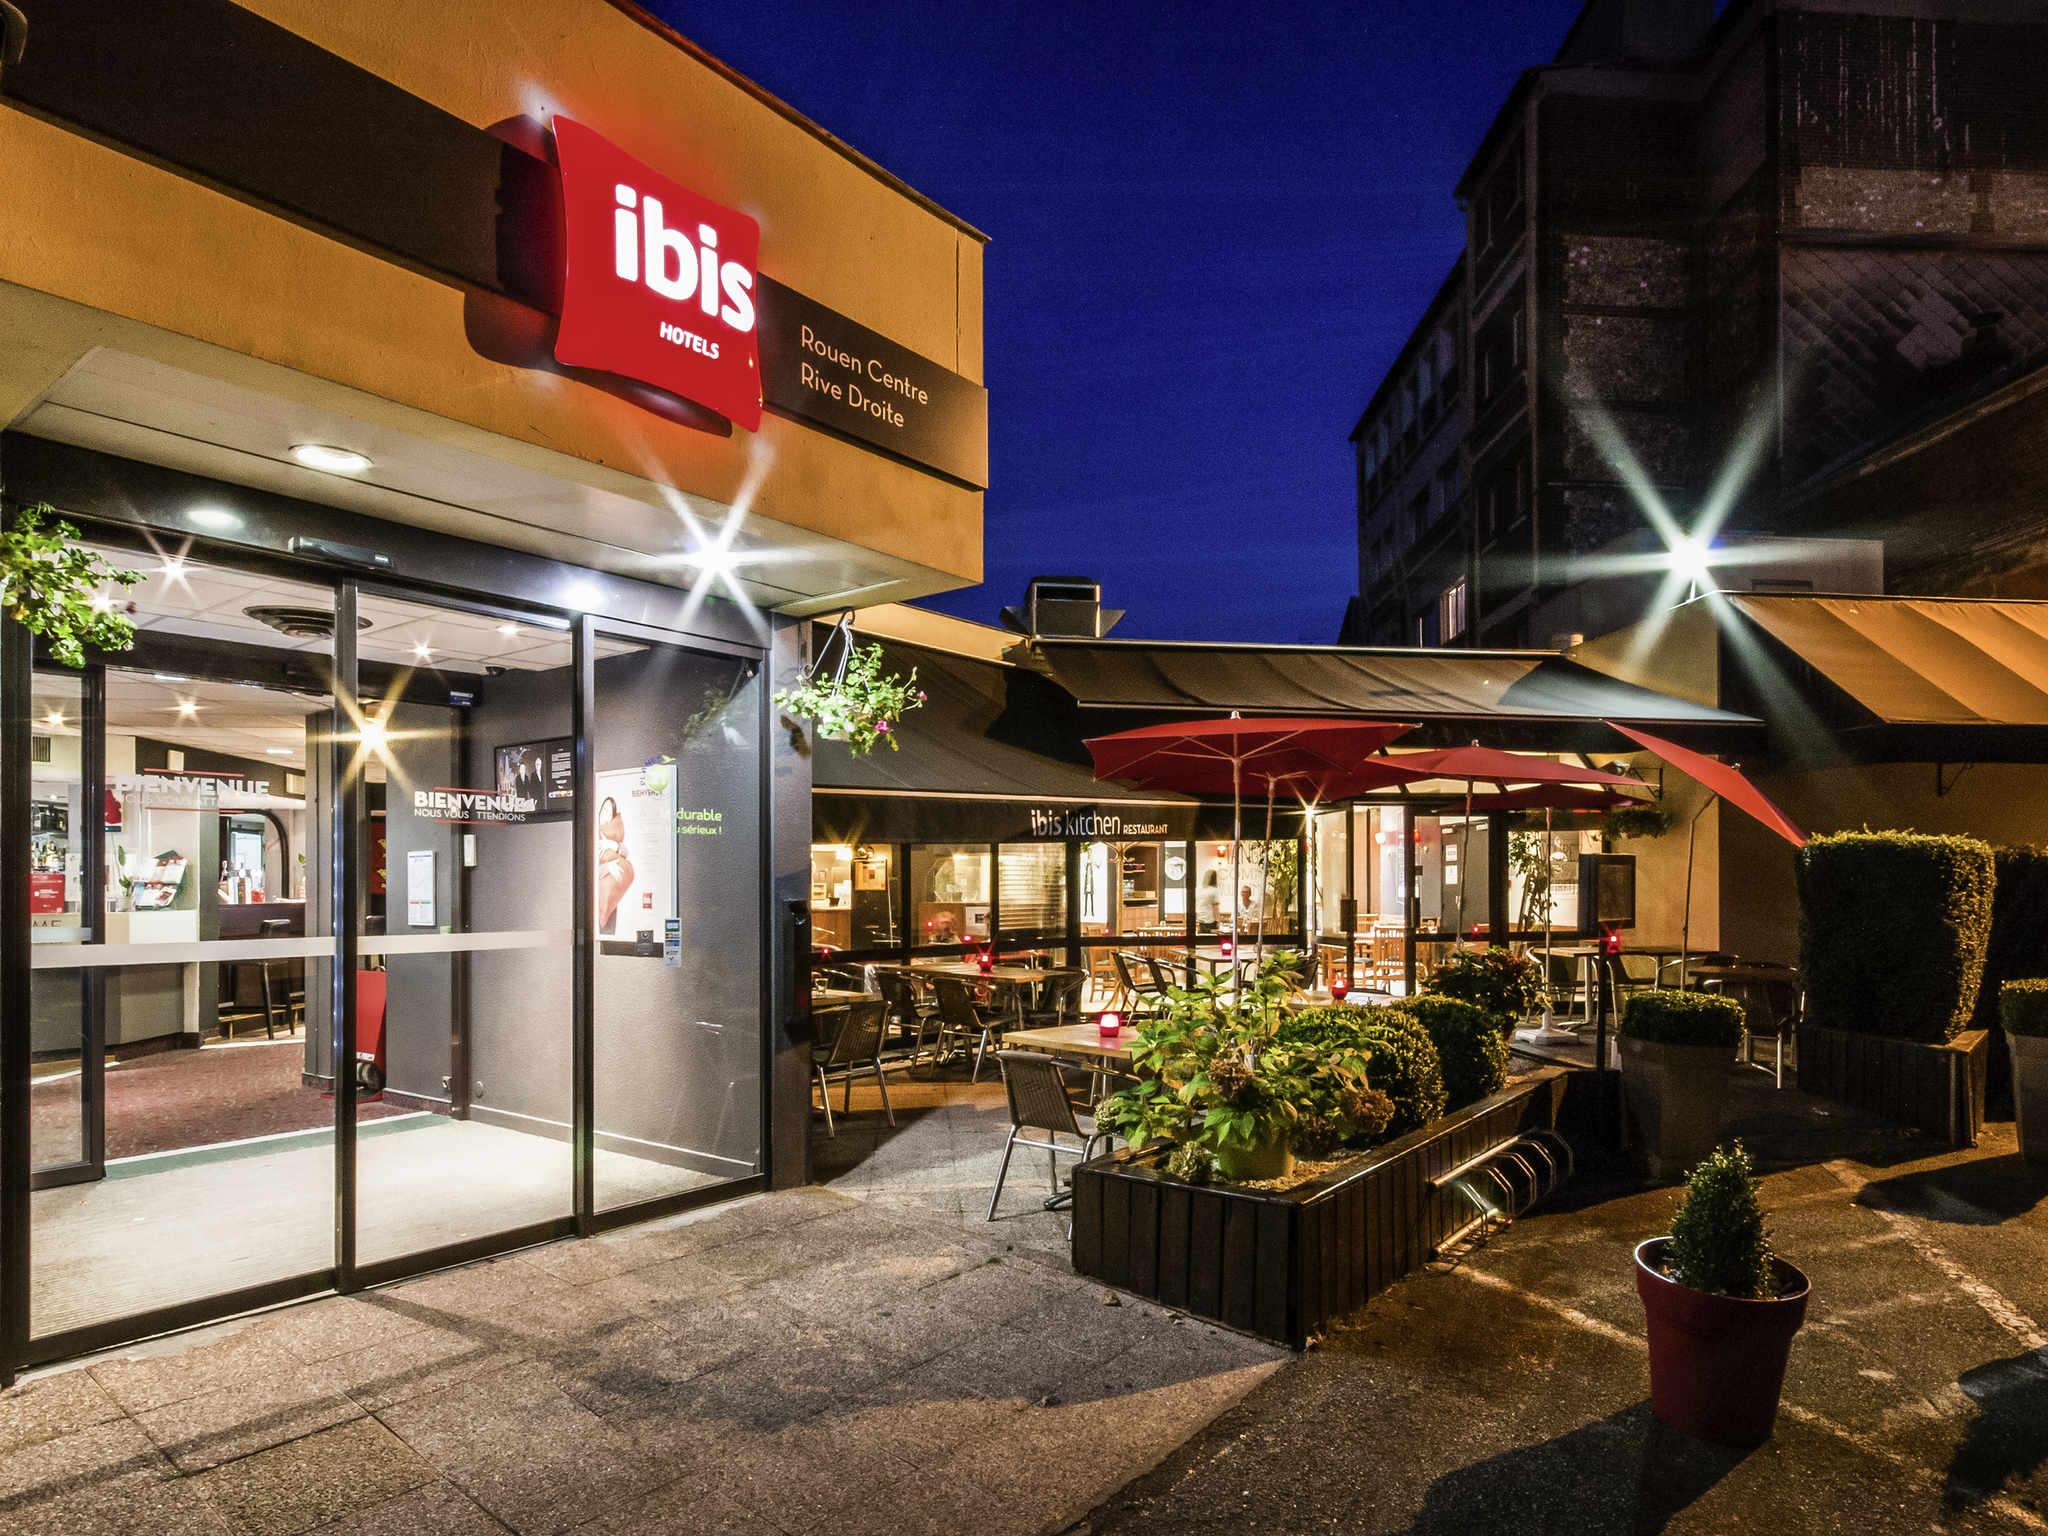 Hotel – ibis Rouen Centre Rive Droite